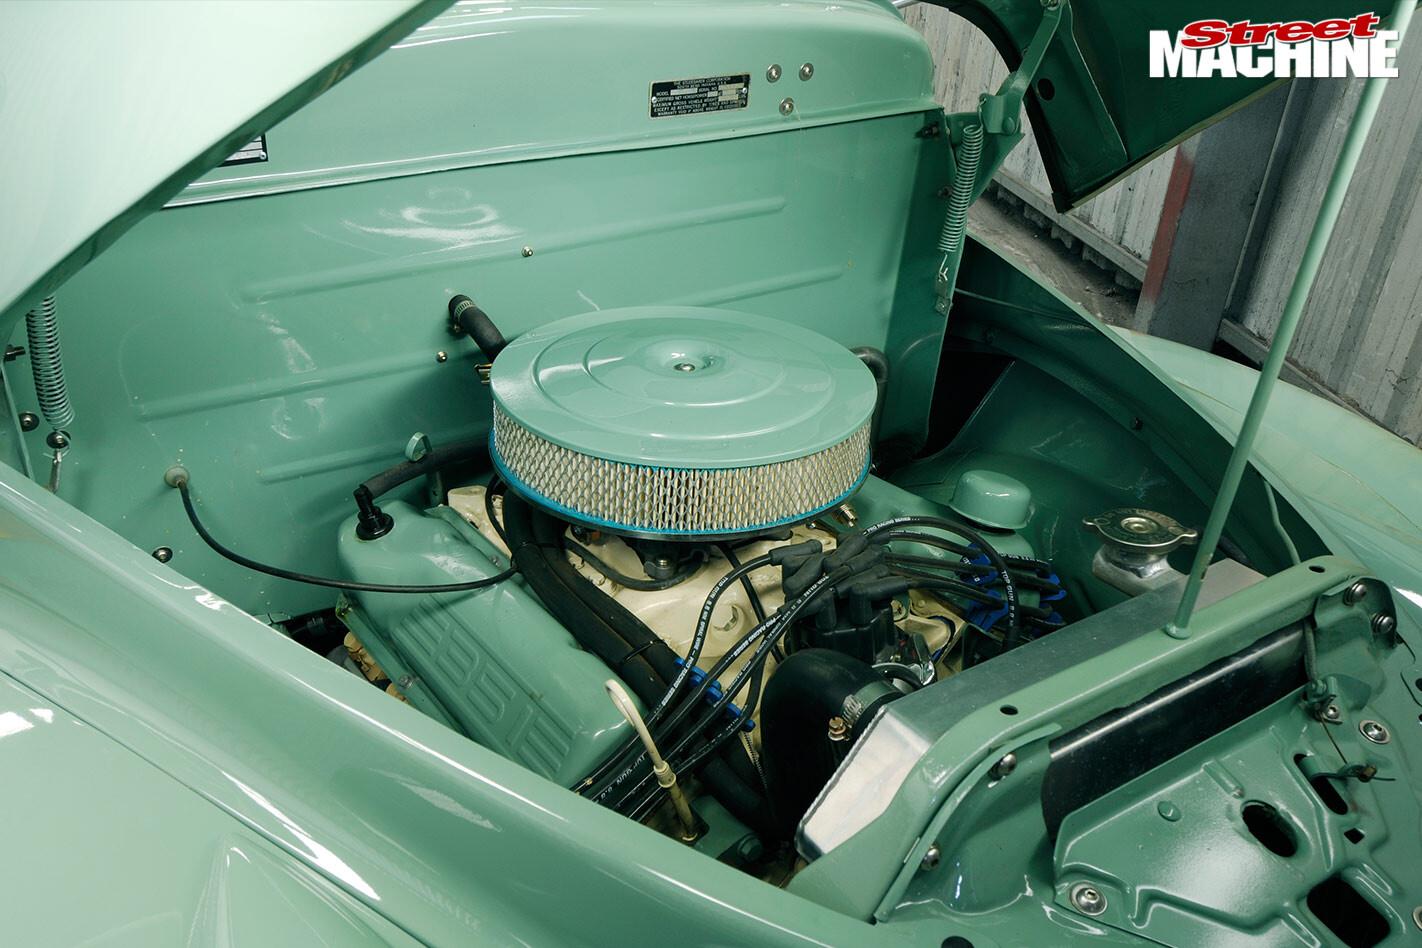 1948 Studebaker M5 pickup engine bay